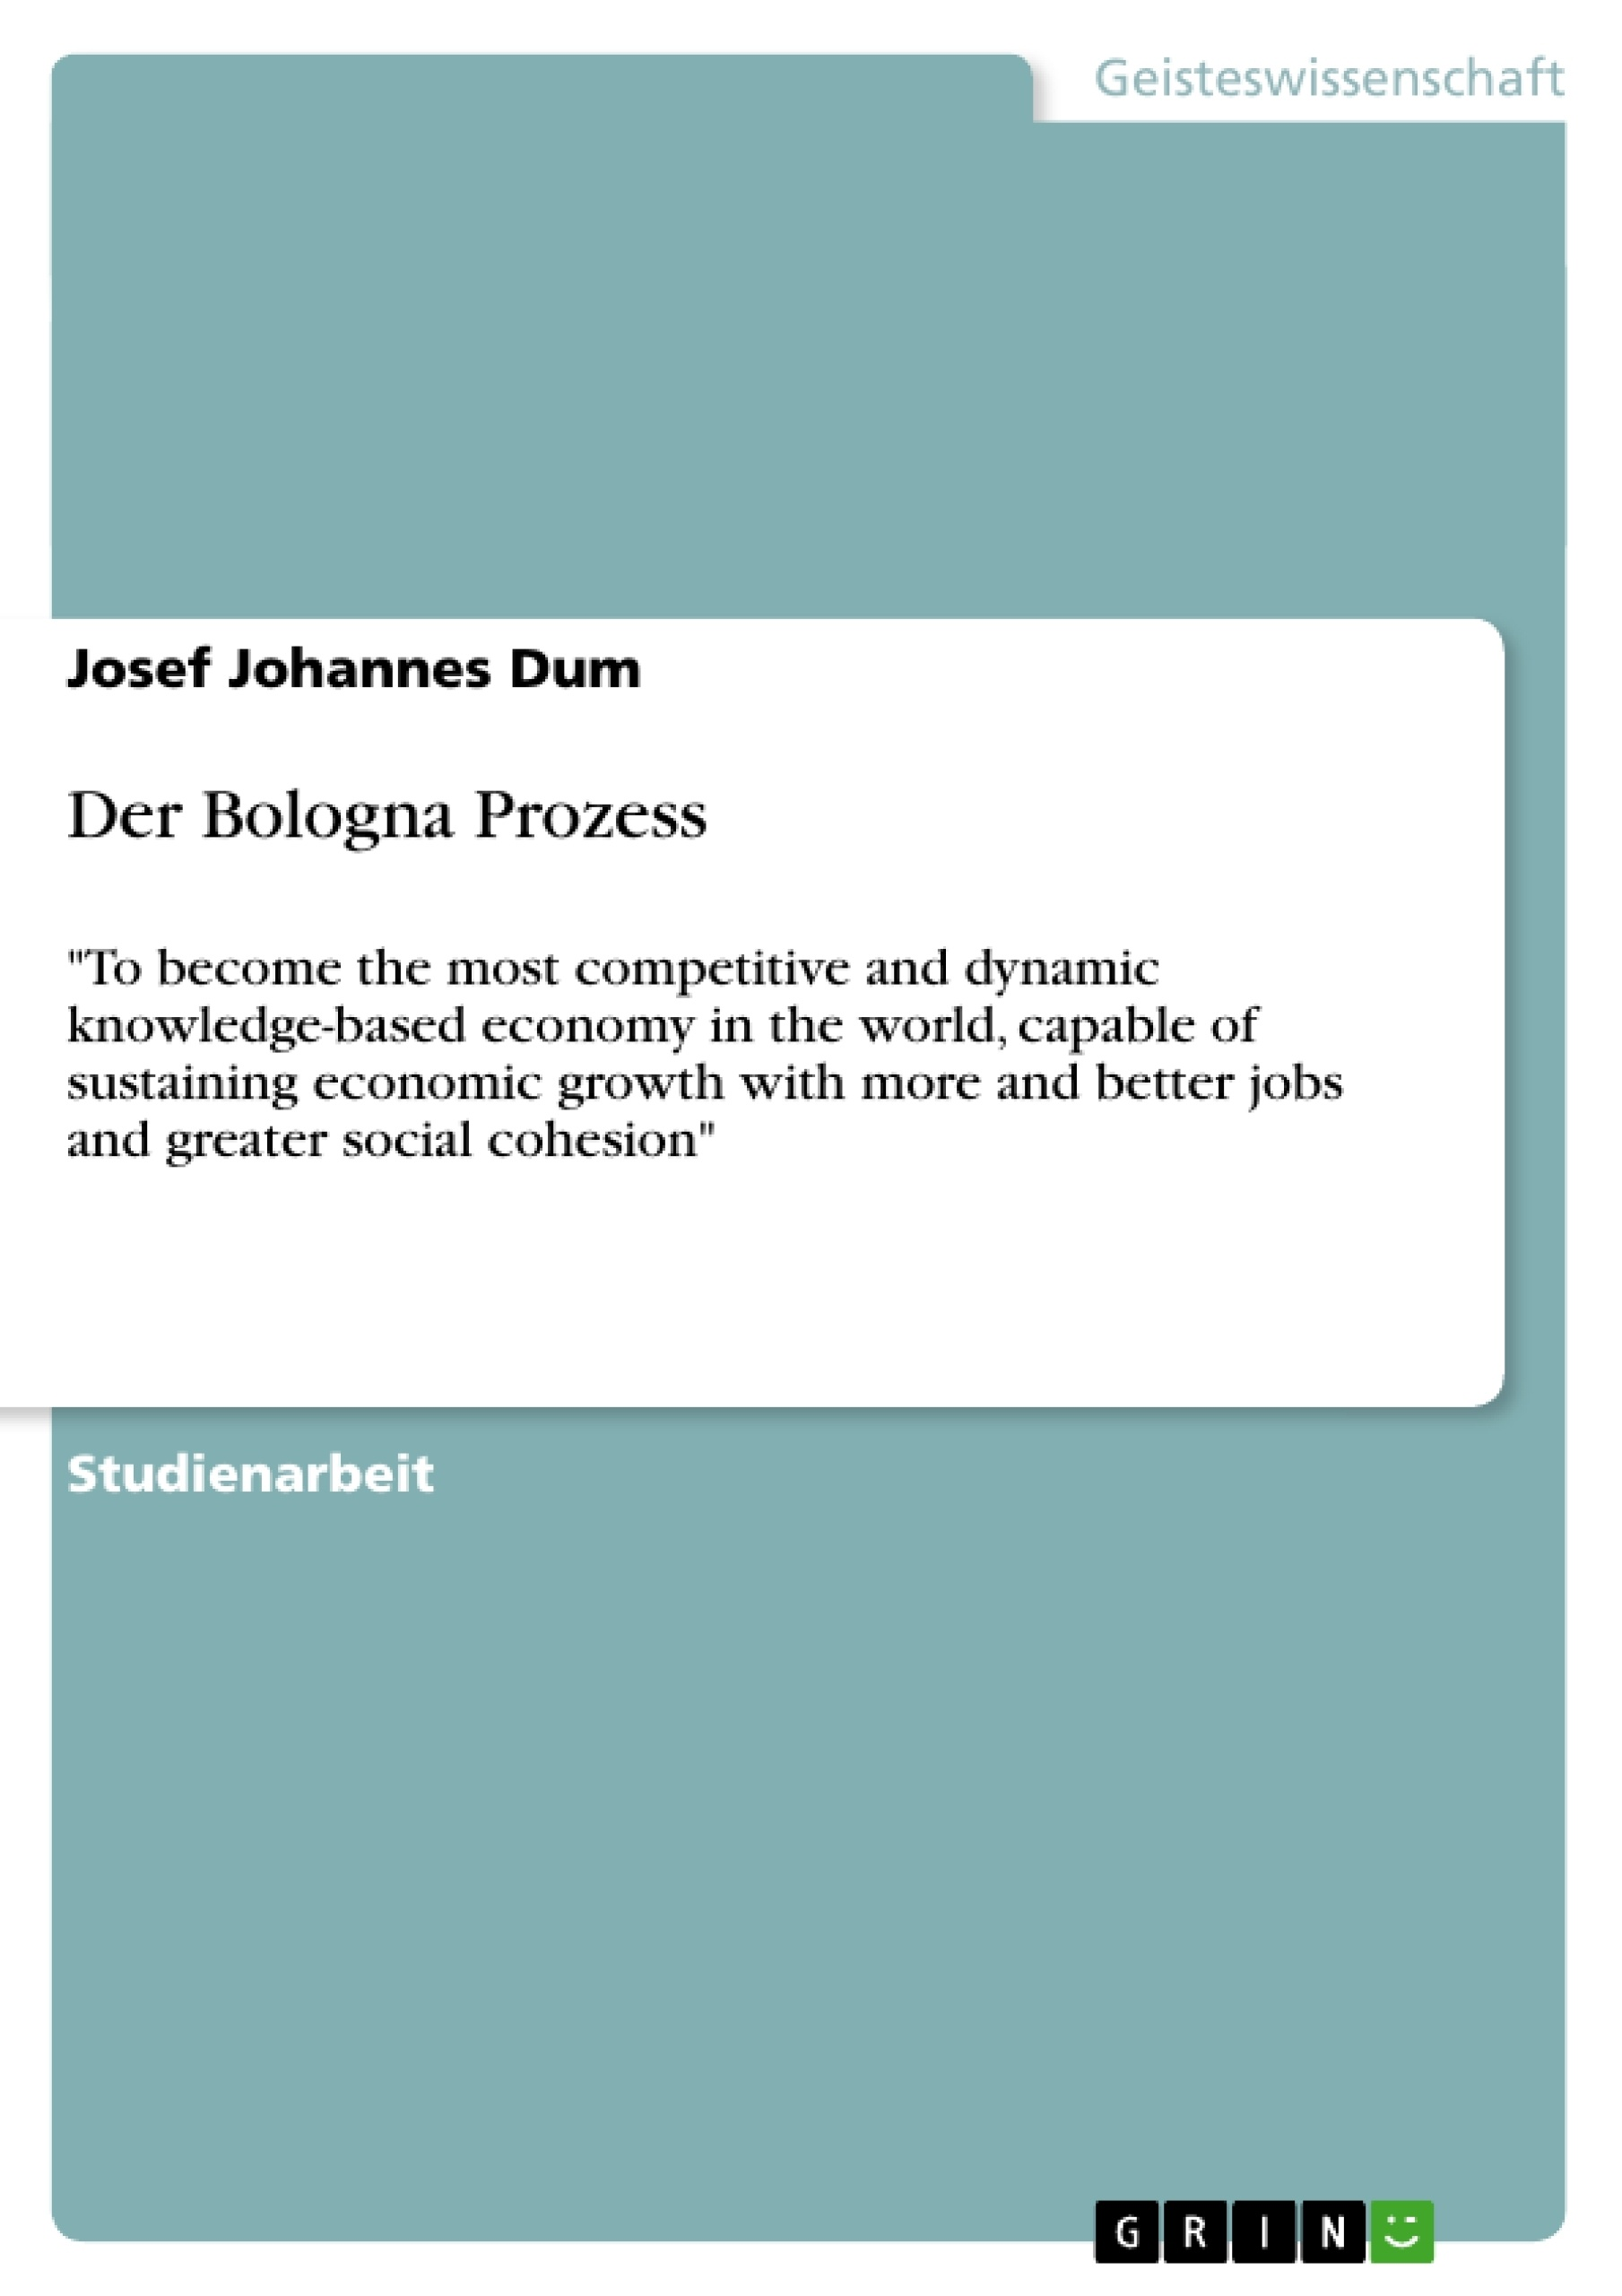 Titel: Der Bologna Prozess